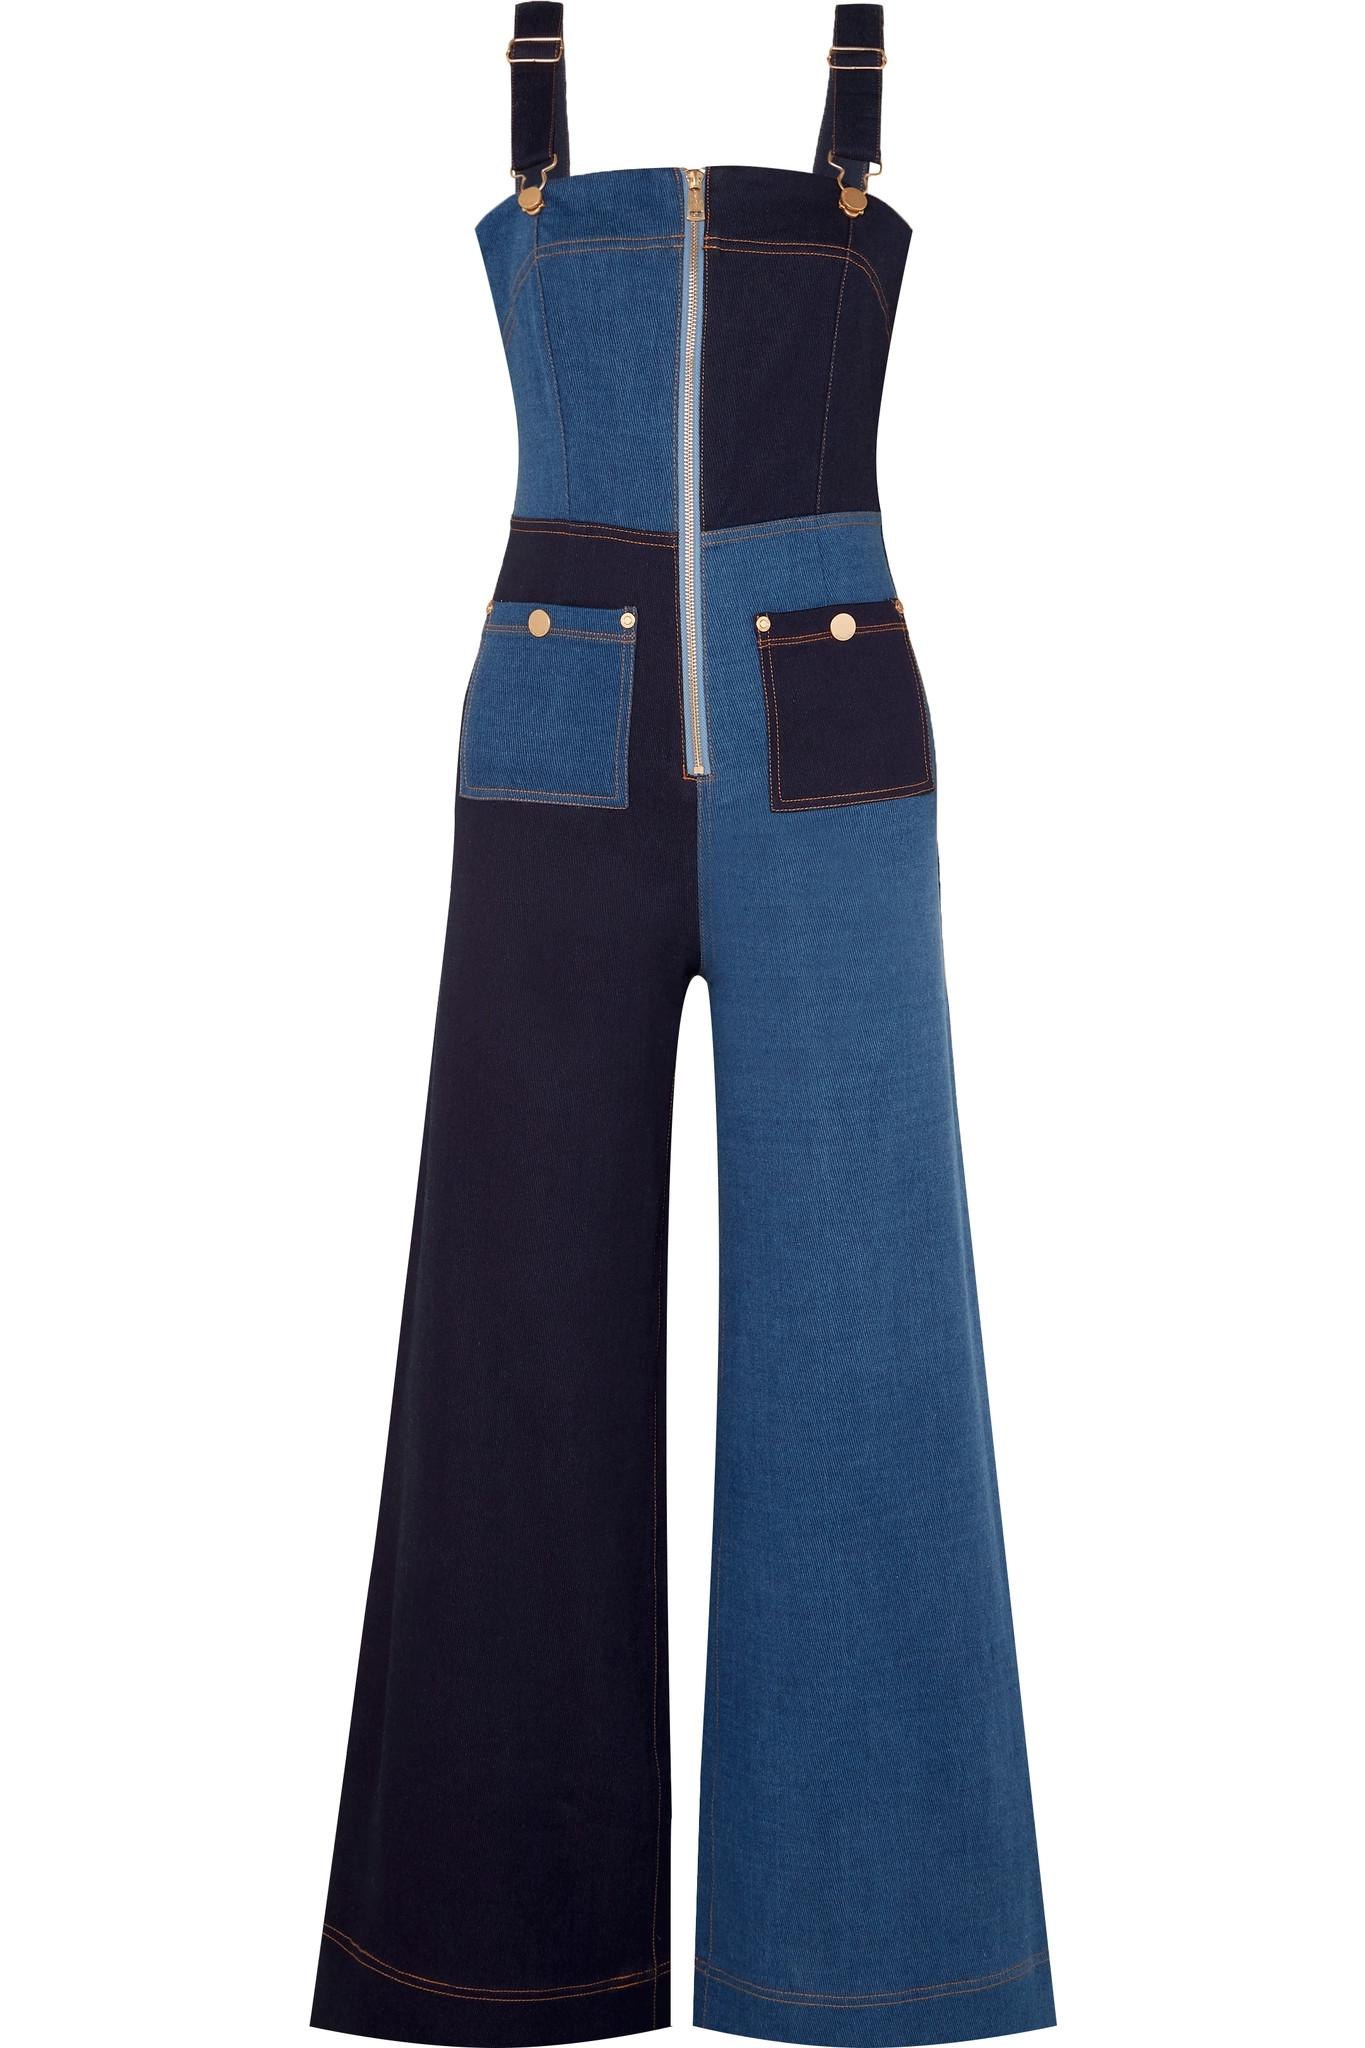 da0c0b95caf1 Alice McCALL Quincy Patchwork Denim Overalls in Blue - Lyst